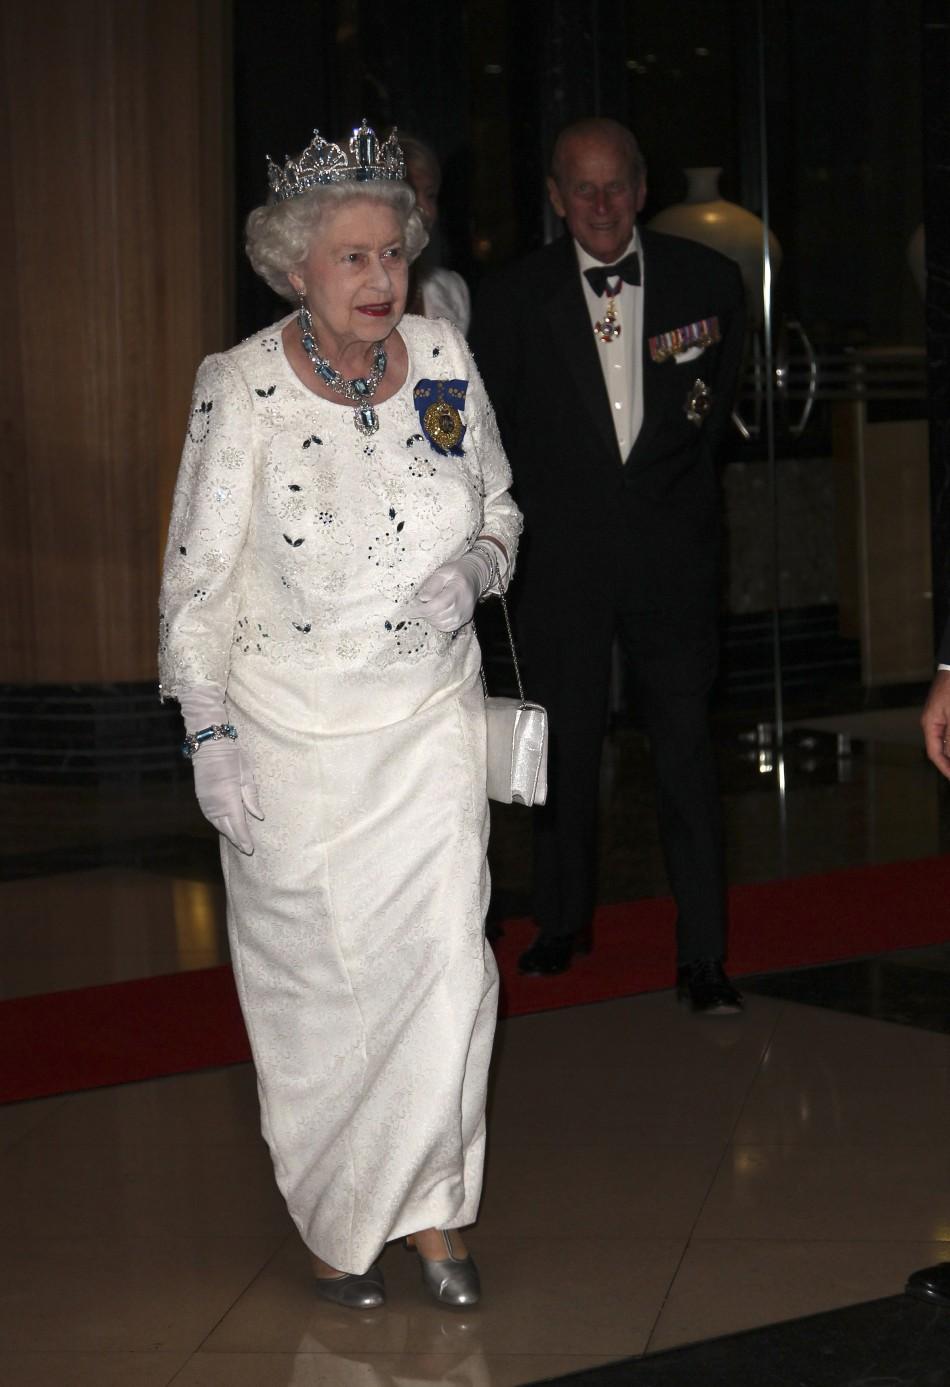 Royal Treasures on Display for Queen Elizabeth's Diamond Jubilee Celebrations